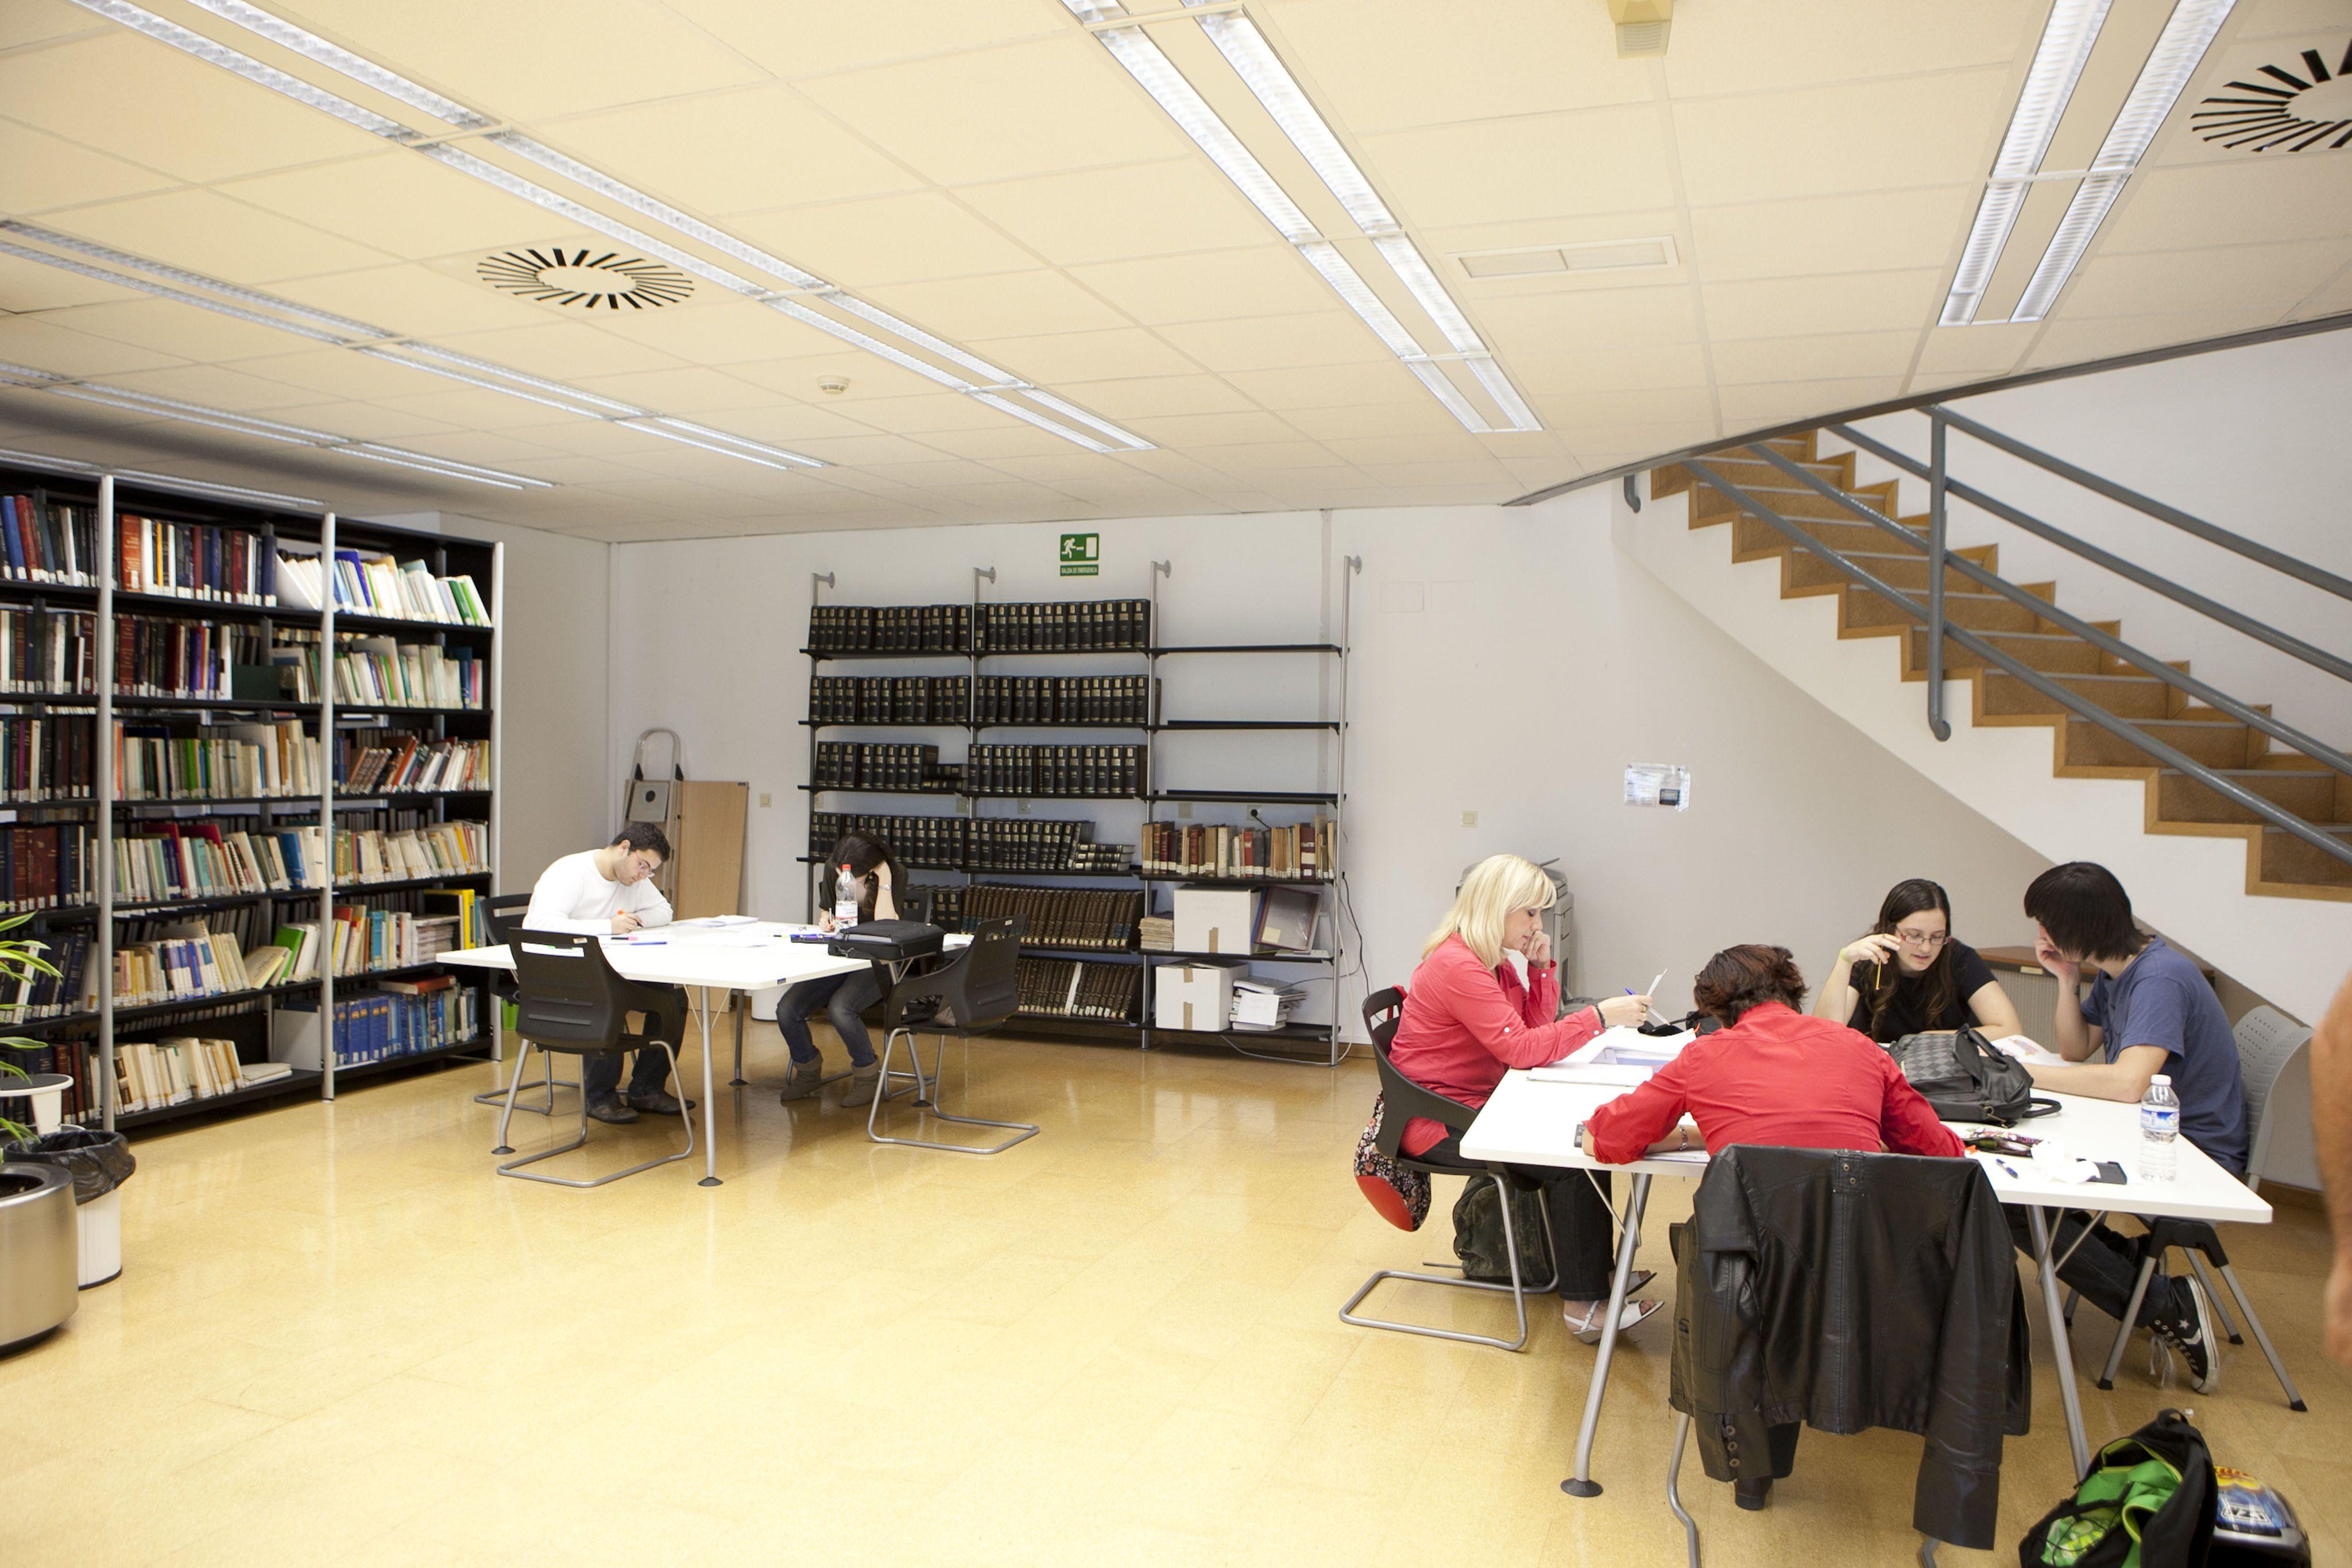 Espacios de estudio en el campus de Sant Joan d'Alacant #UMH.